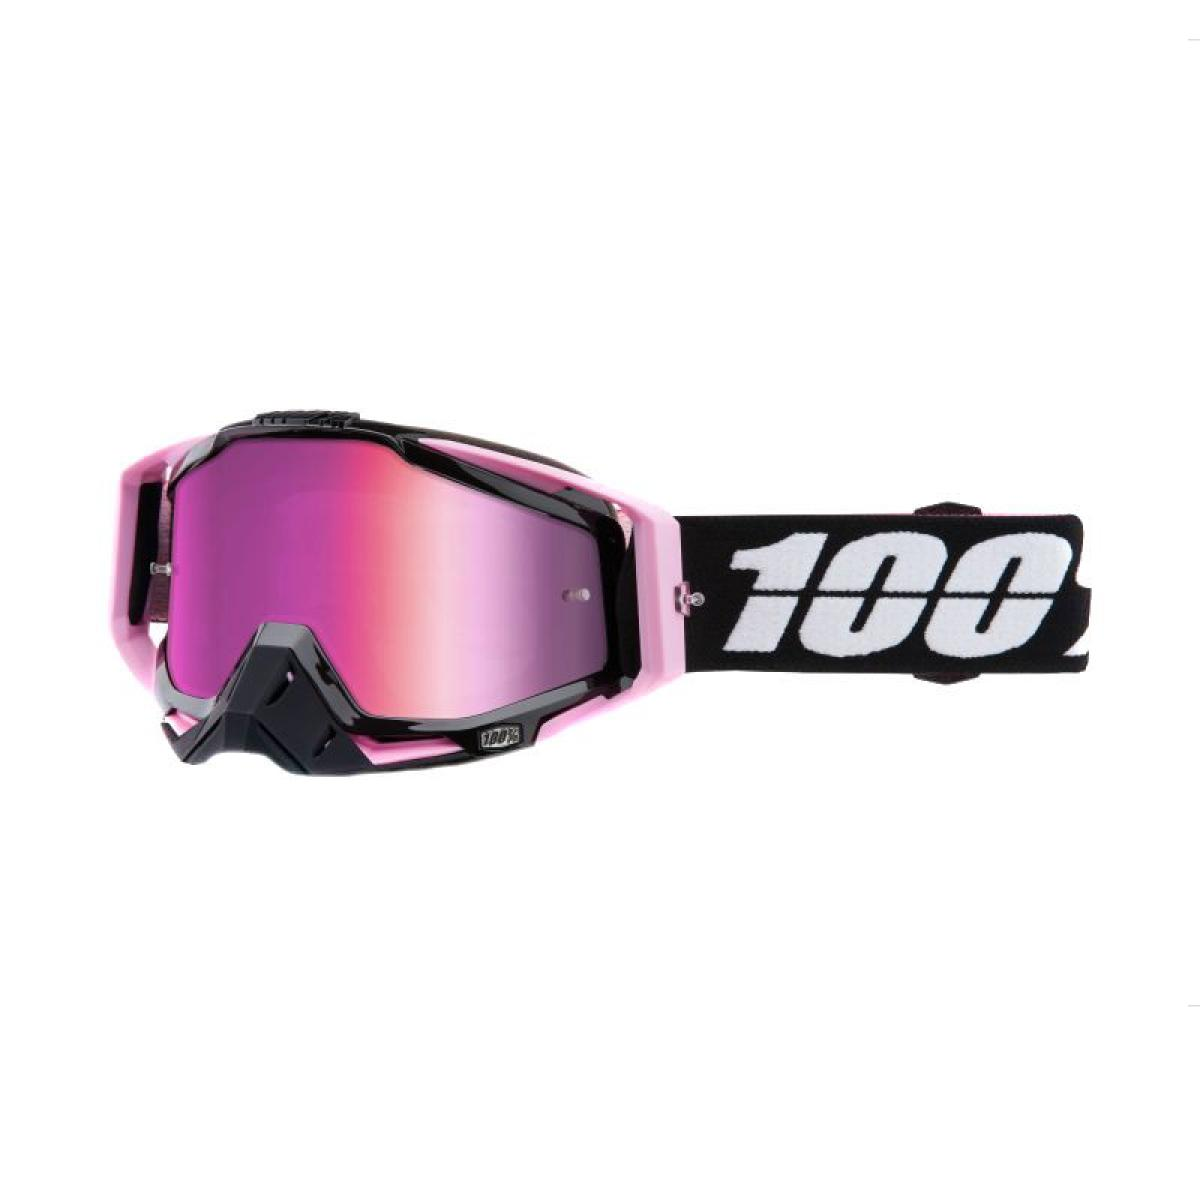 Masque Moto Cross 100 Racecraft Floyd Ecran Iridium